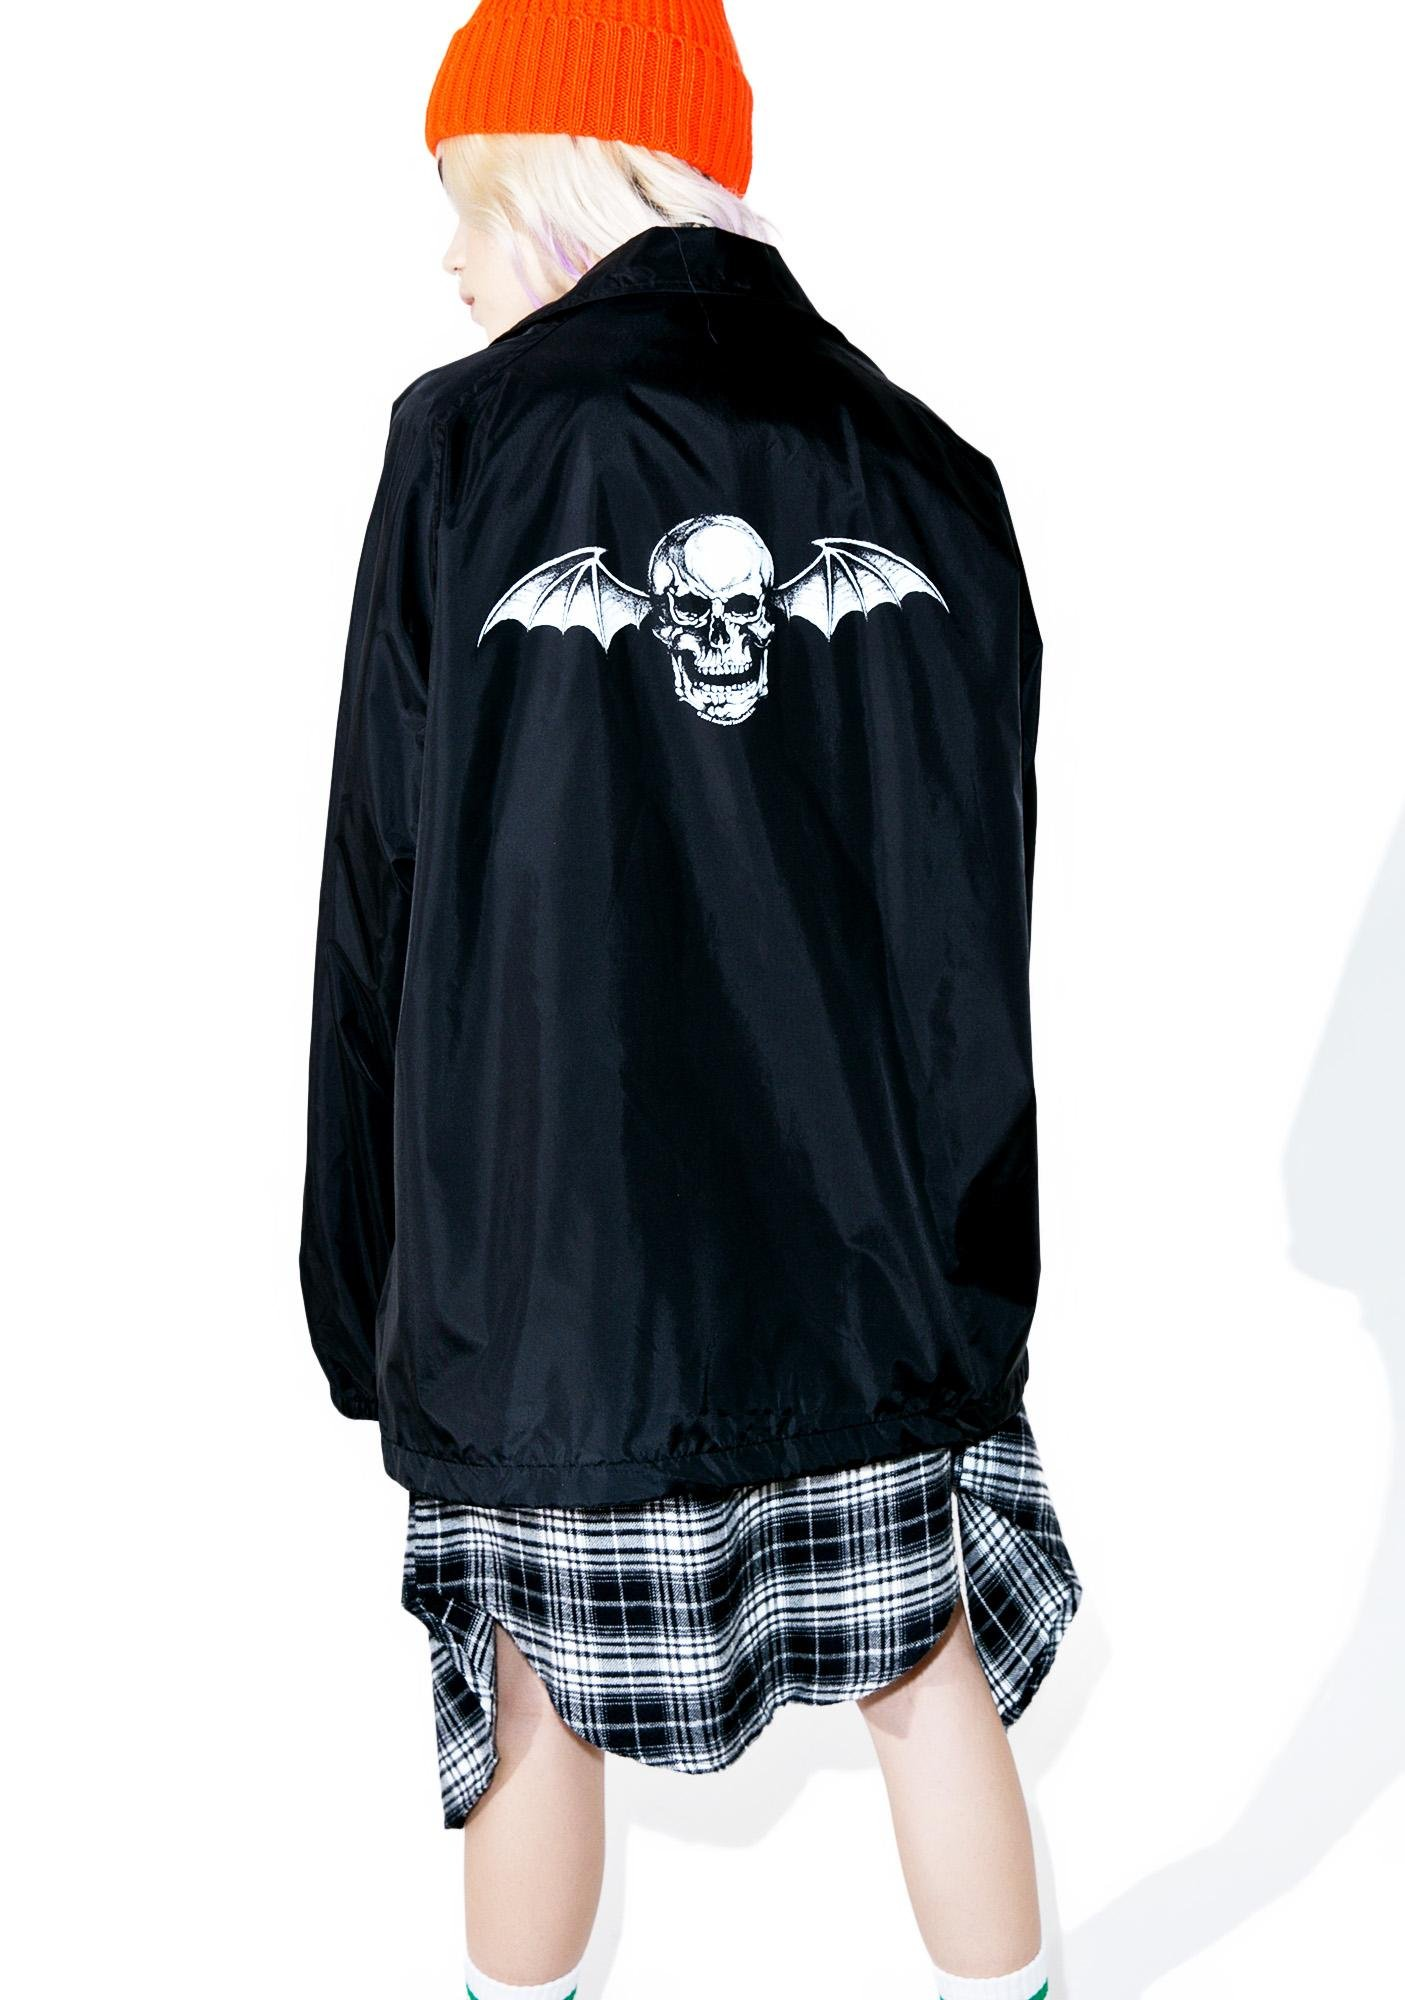 Afterlife Coaches Jacket